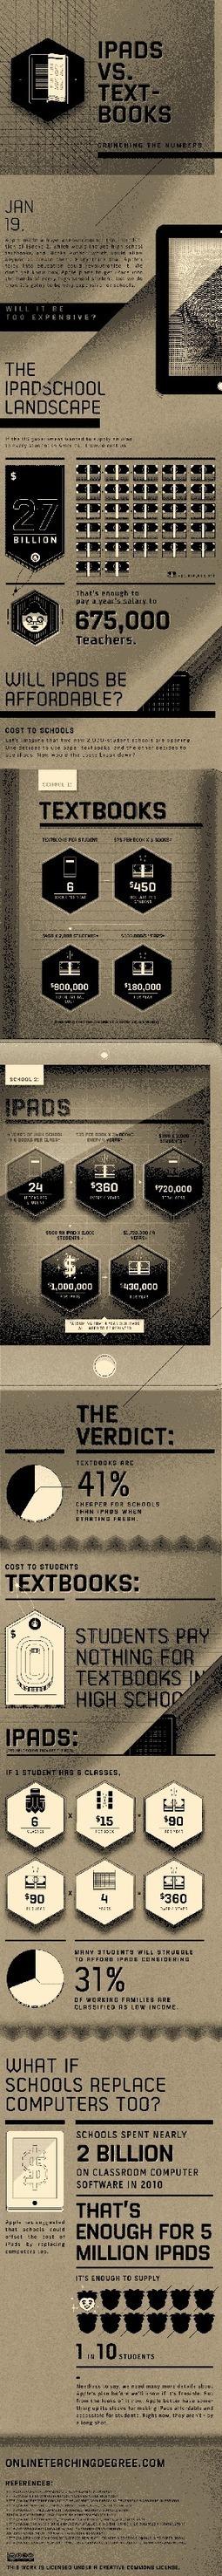 iPad vs libros de texto #infografia #infographic #apple#education | CienciadelaOEI | Scoop.it